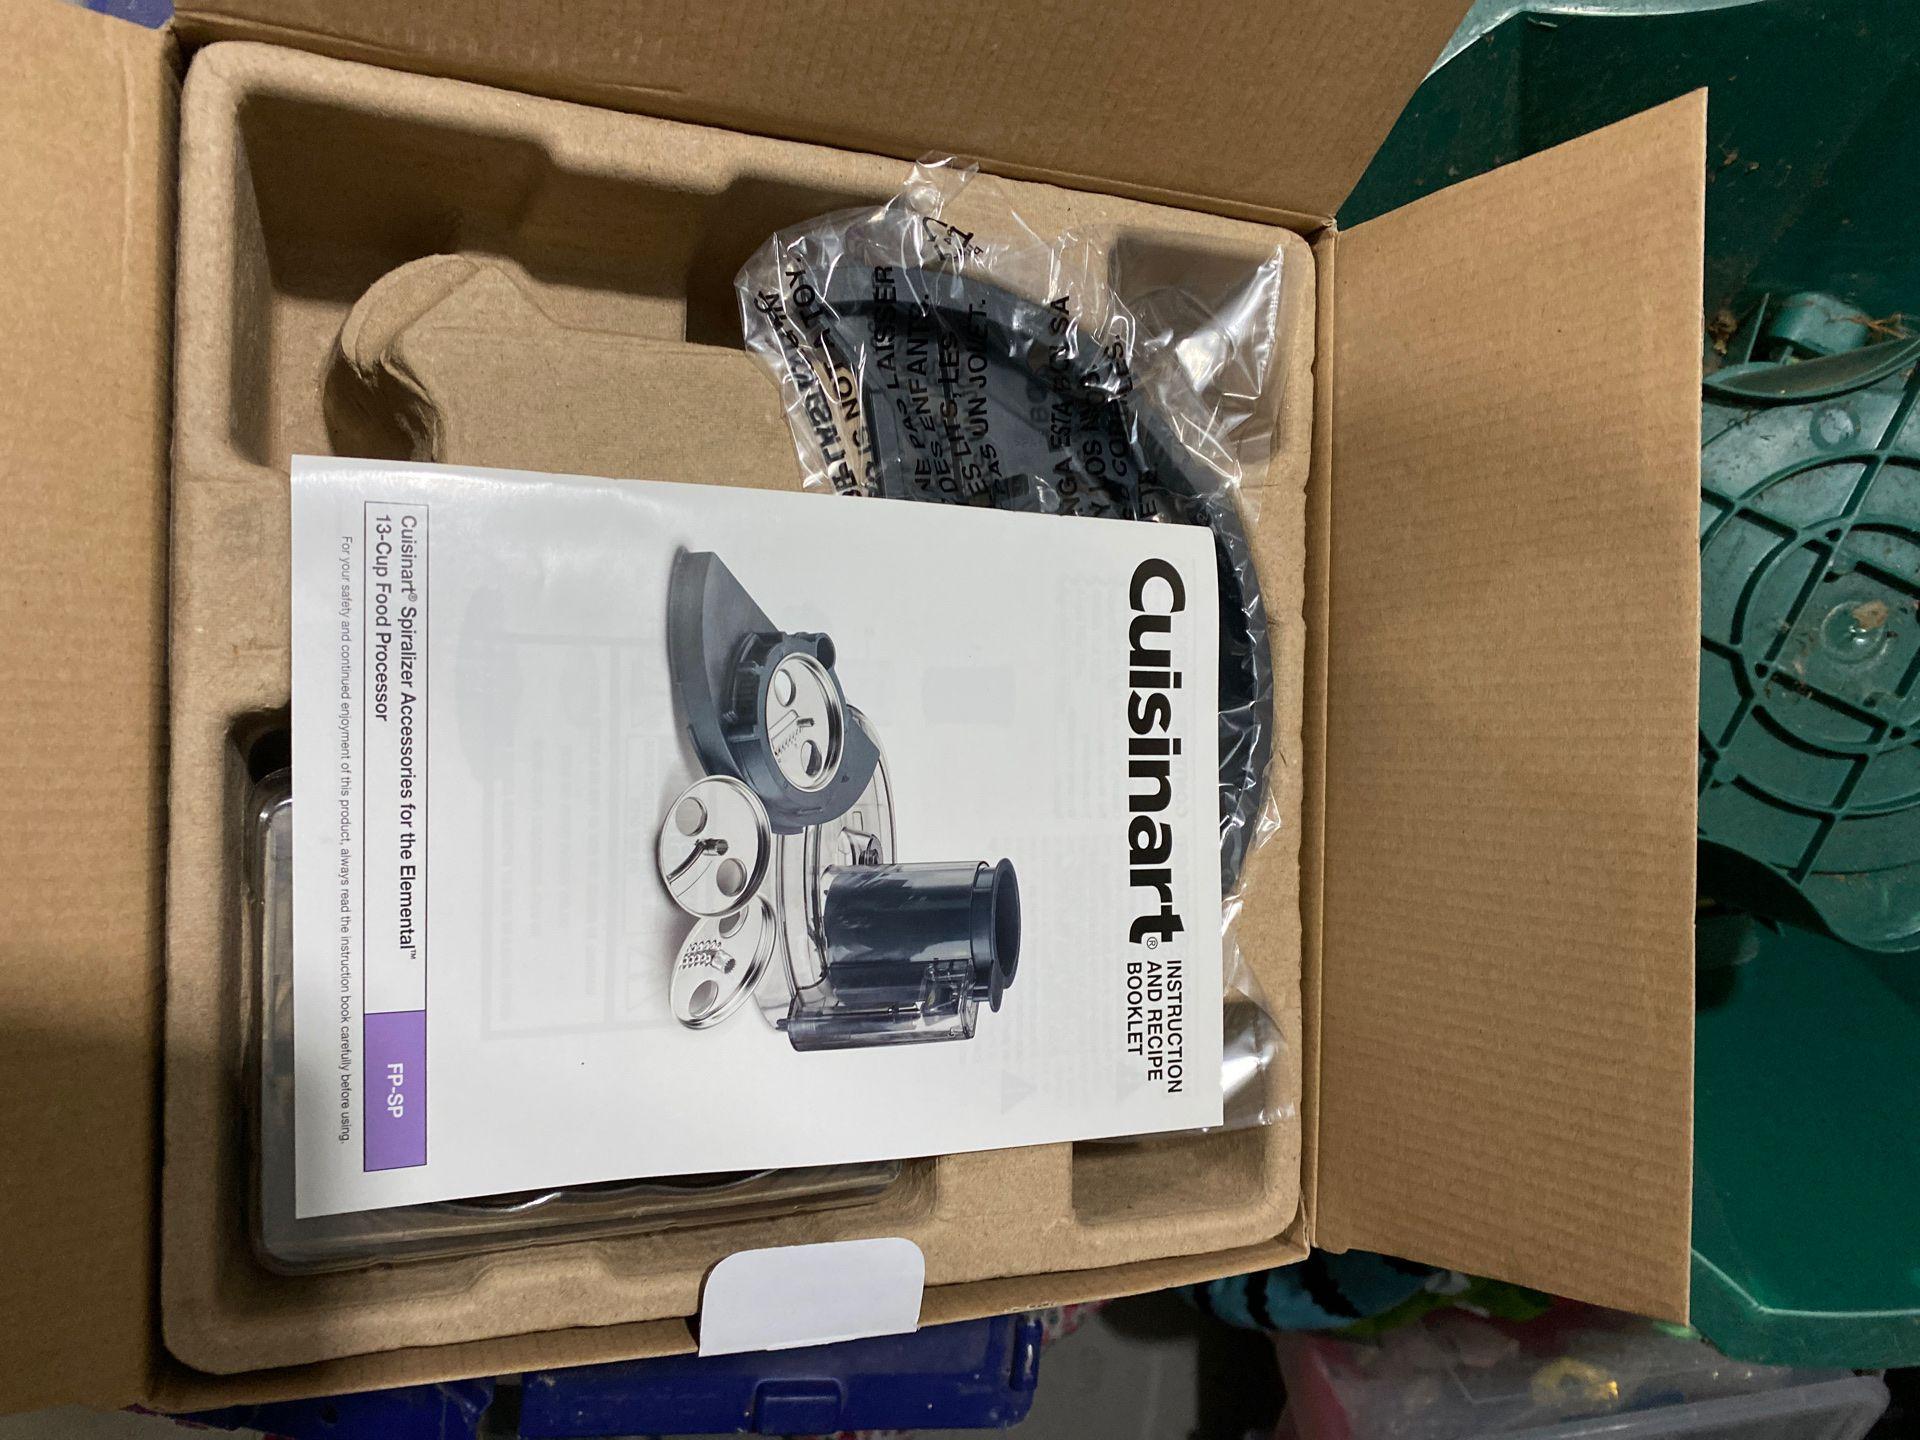 New in Box: Cuisinart Food Processor Spiralizer Set